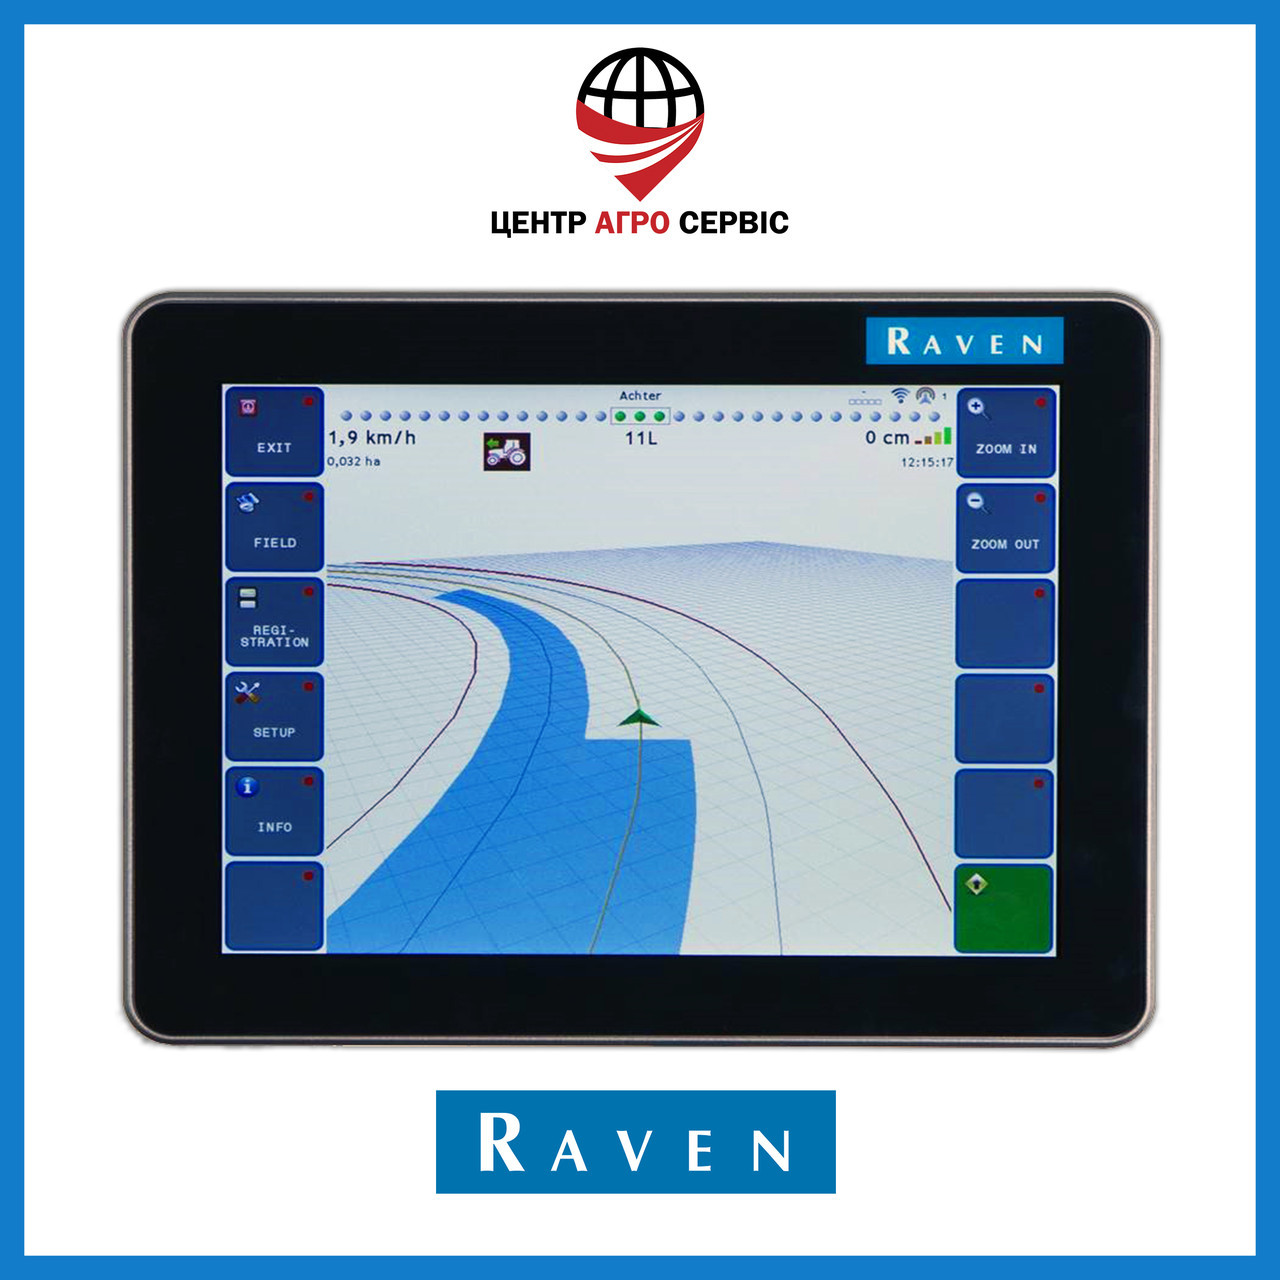 Gps навигатор для трактора (навигатор для поля, сельхоз навигатор)  RAVEN viper 4